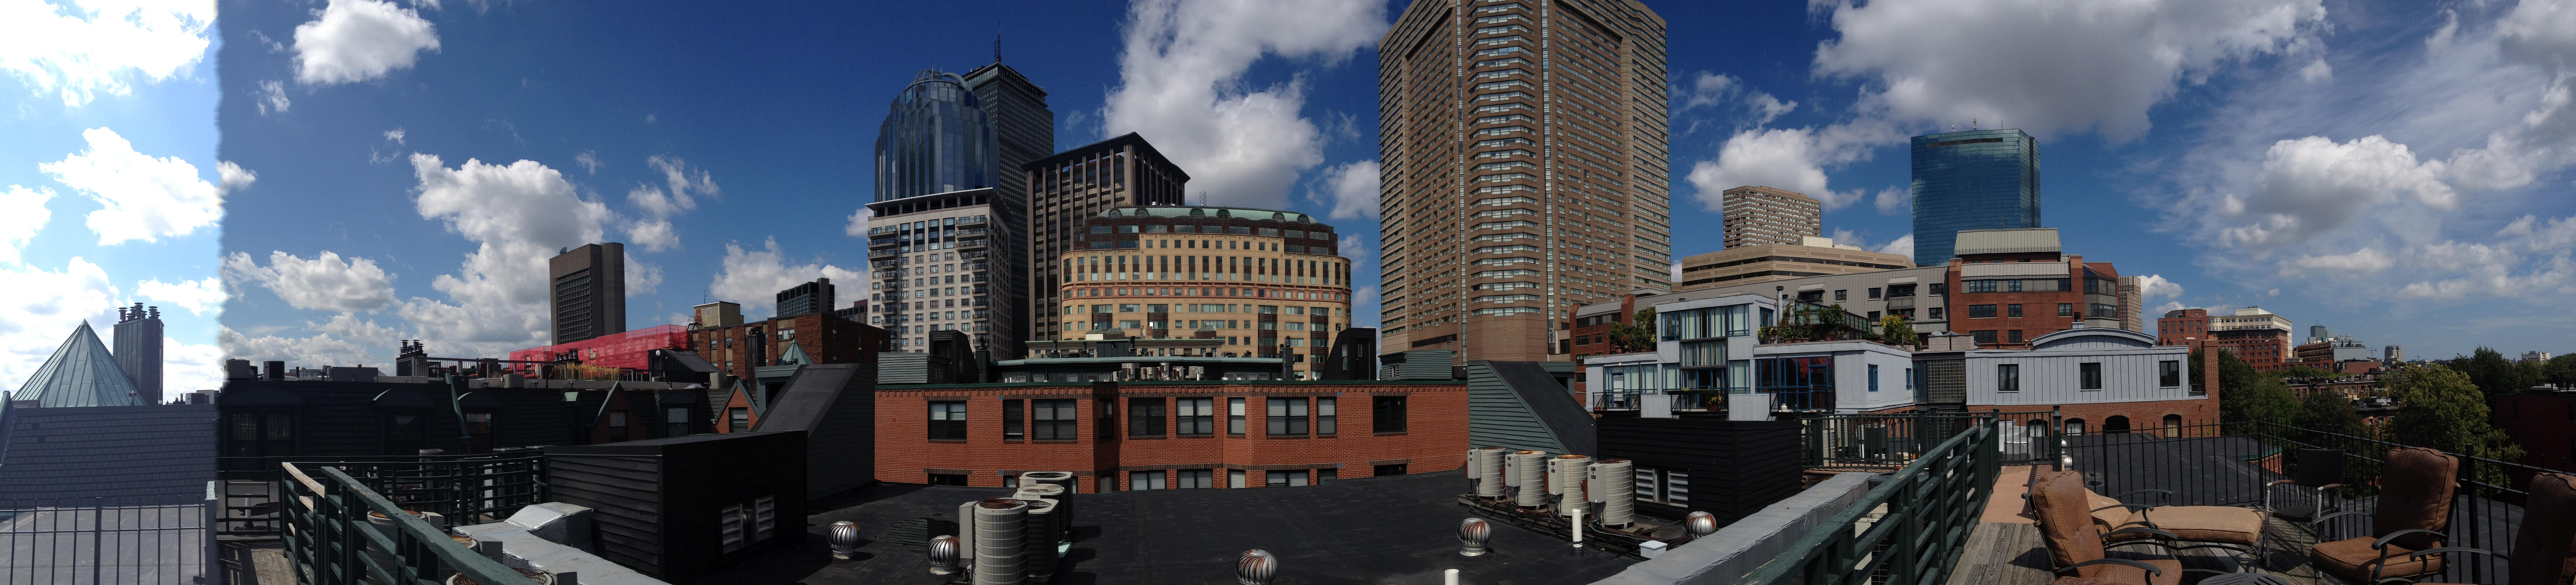 Relaxing Roof Top vs. Boston Skyline